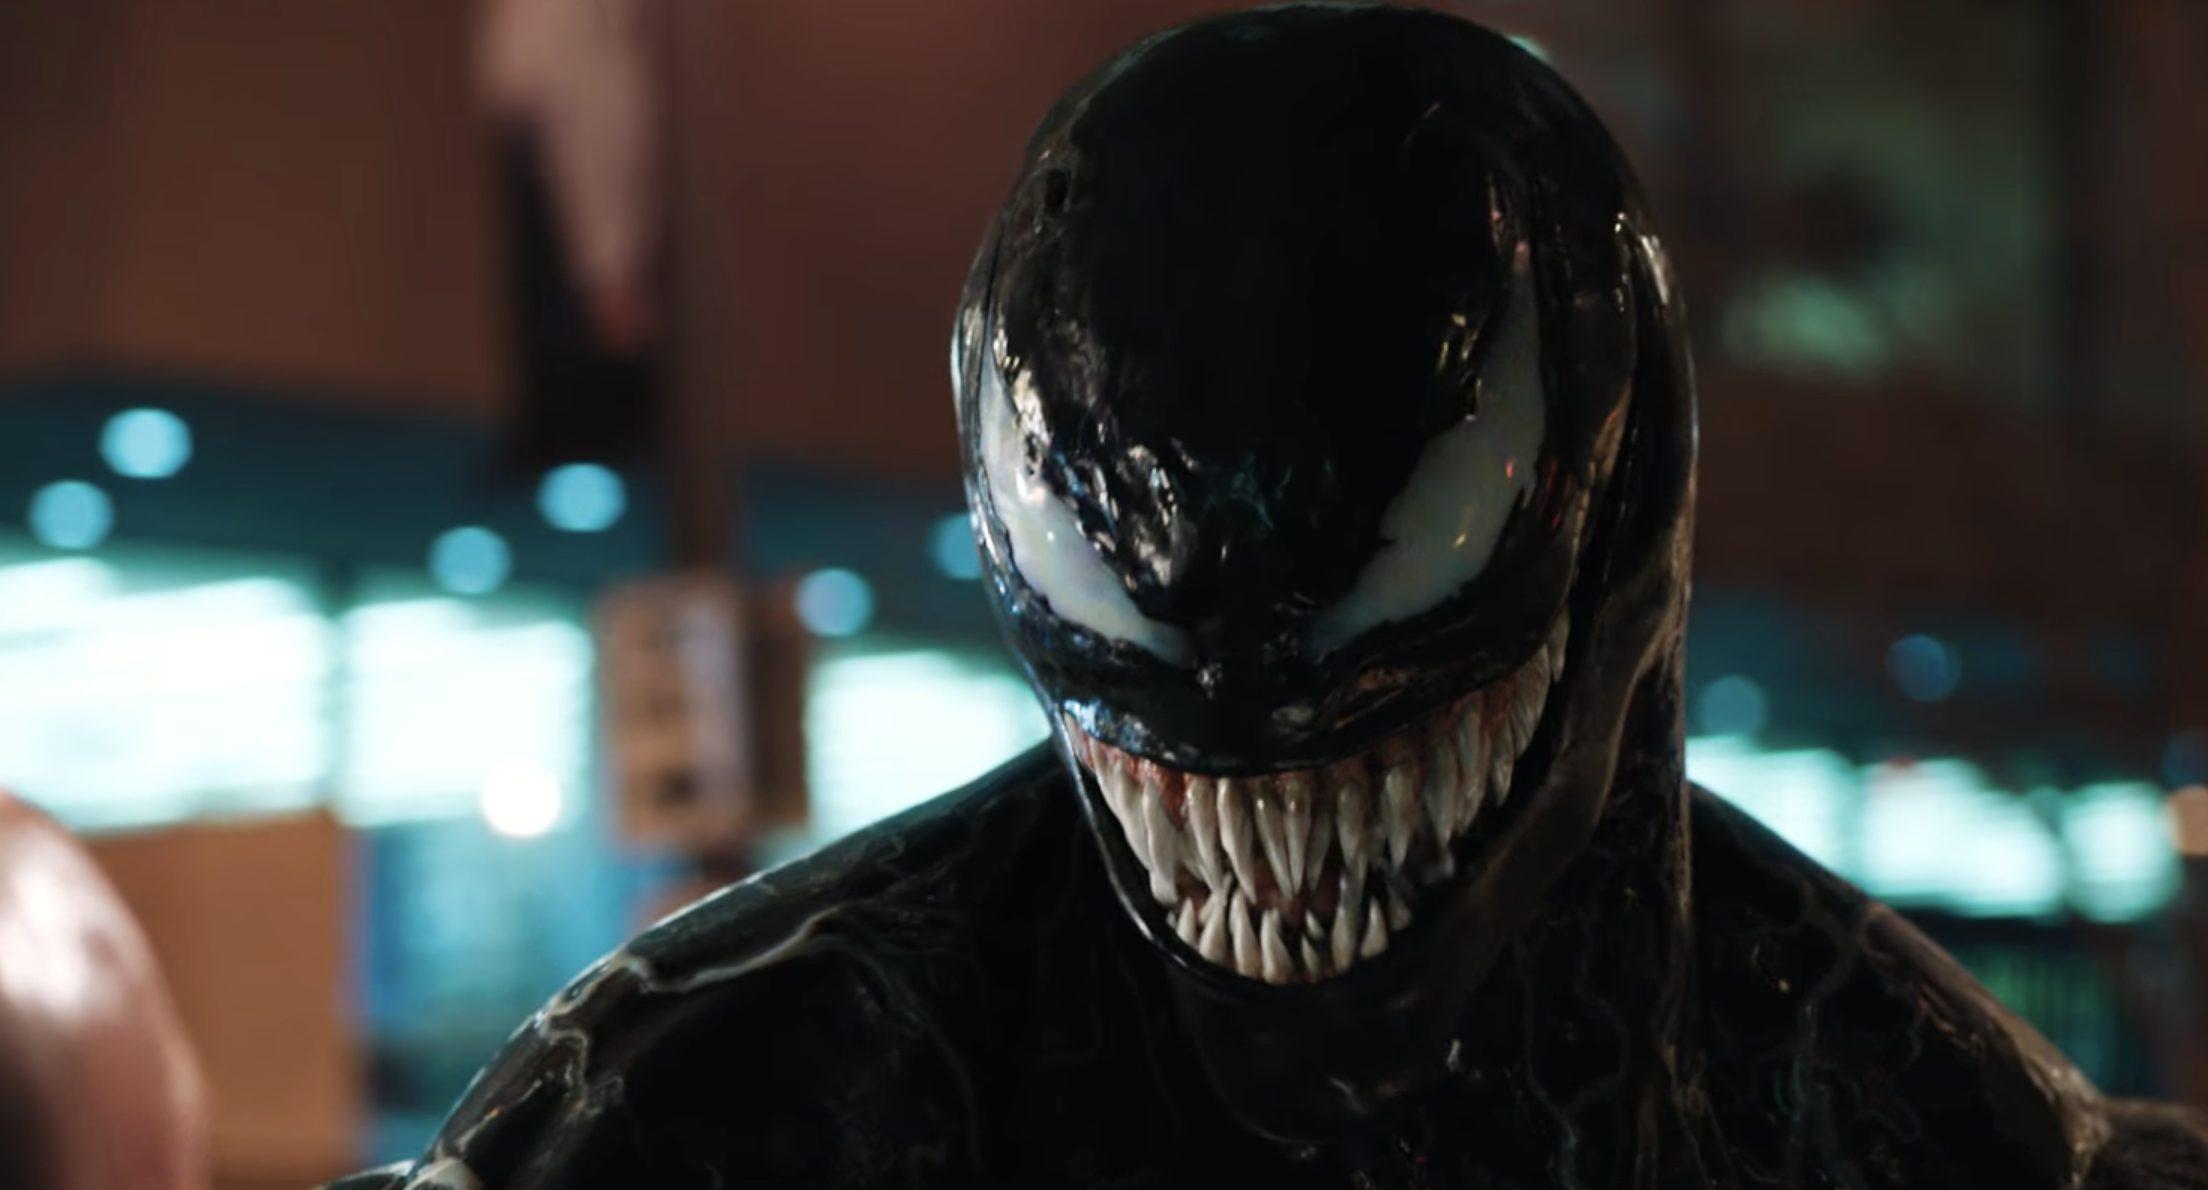 https://cinemaplanet.pt/wp-content/uploads/2018/08/venom.jpg